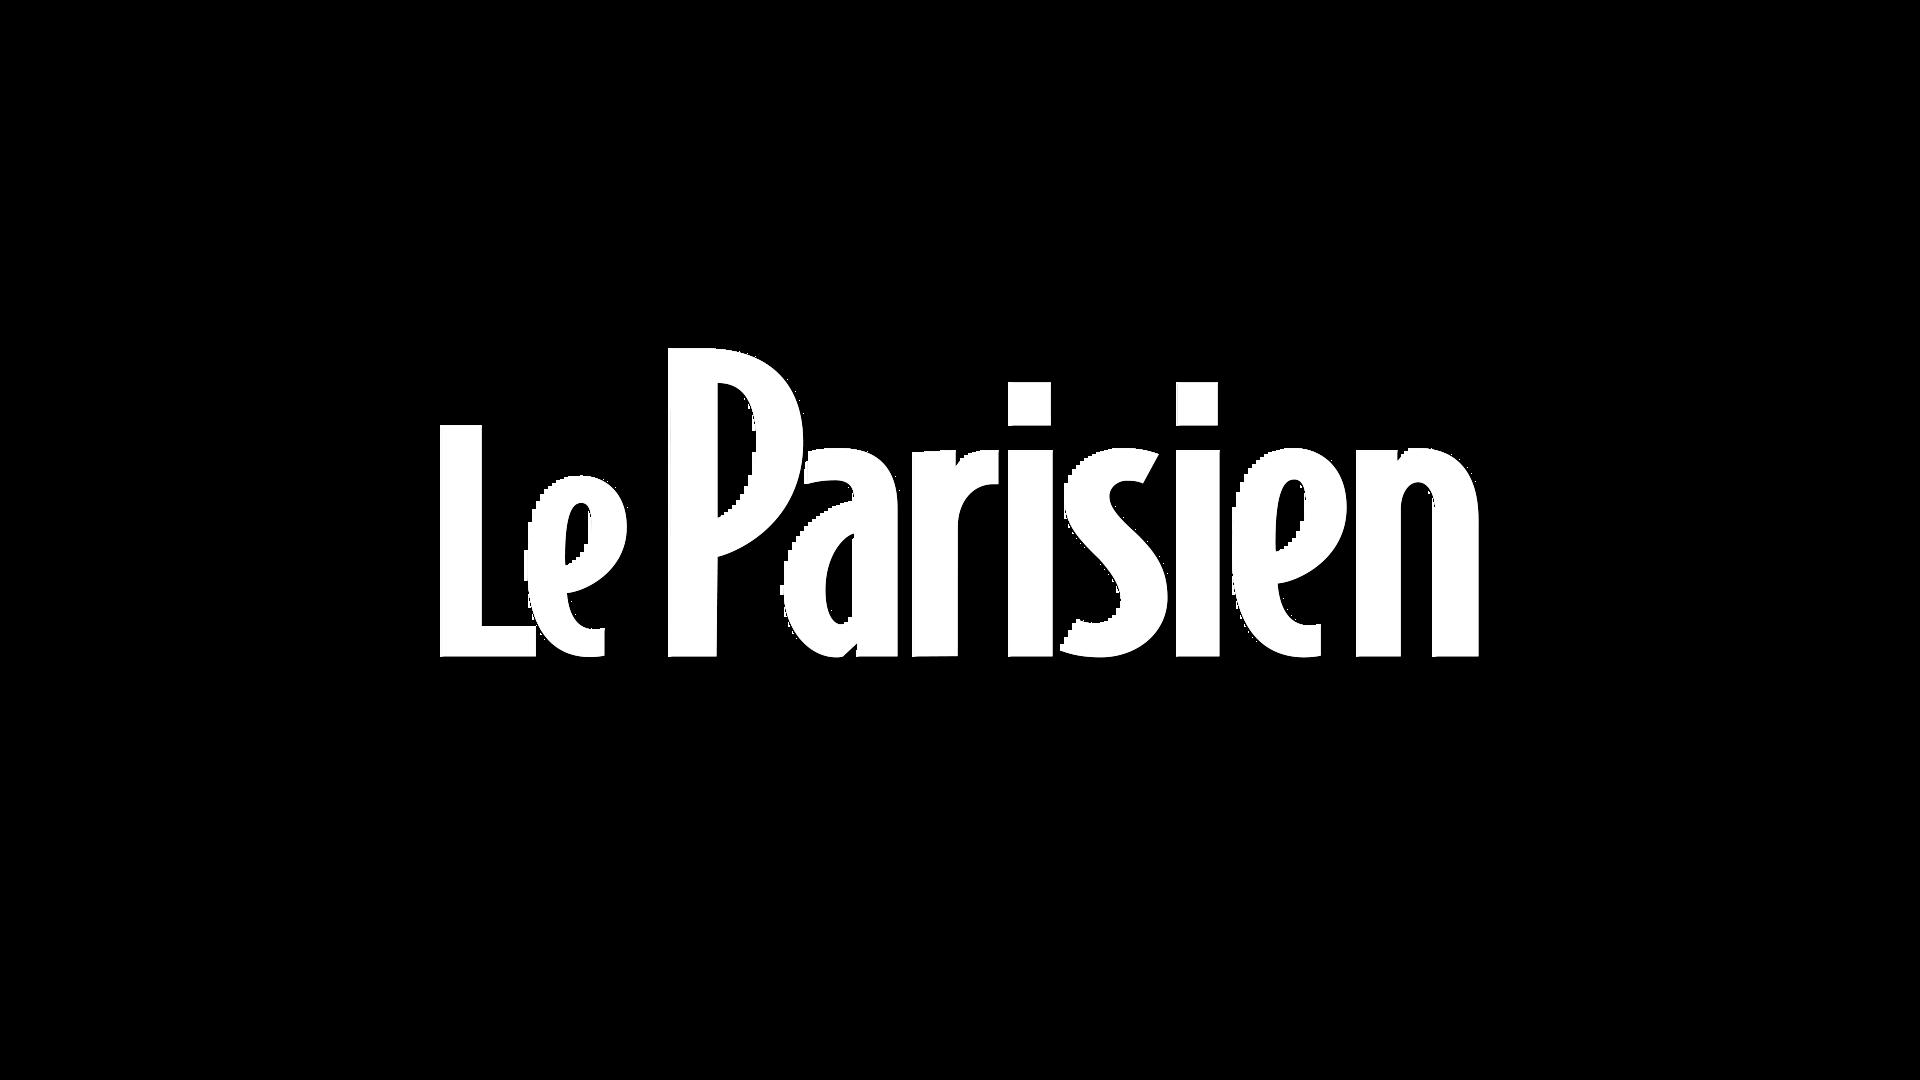 G Saitis: Leparisien Ταυότητες,ένα νέο πεδίο για το FN